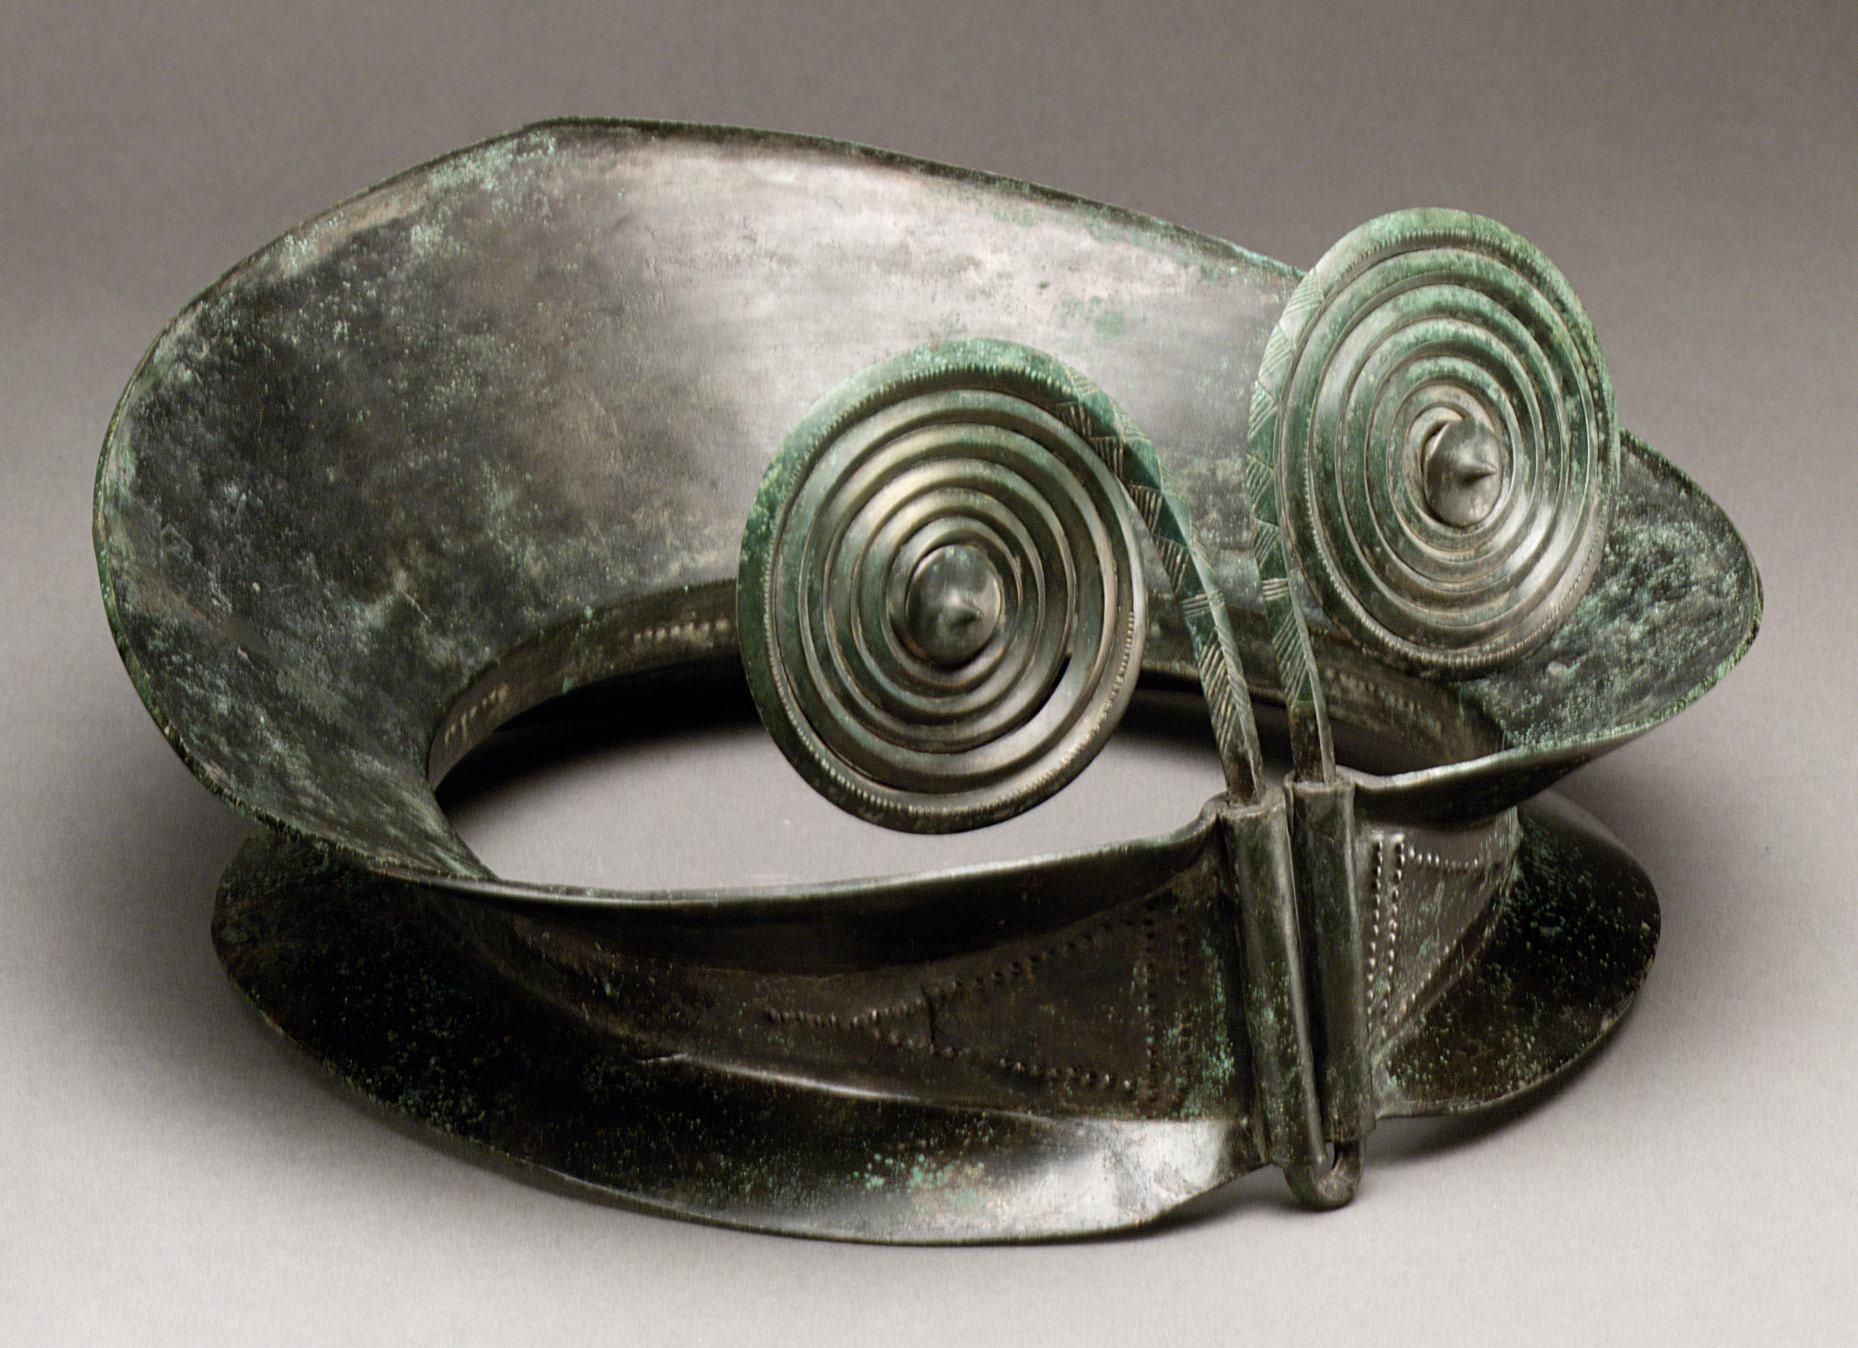 Unique Ancient Wire Rings For Men Embellishment